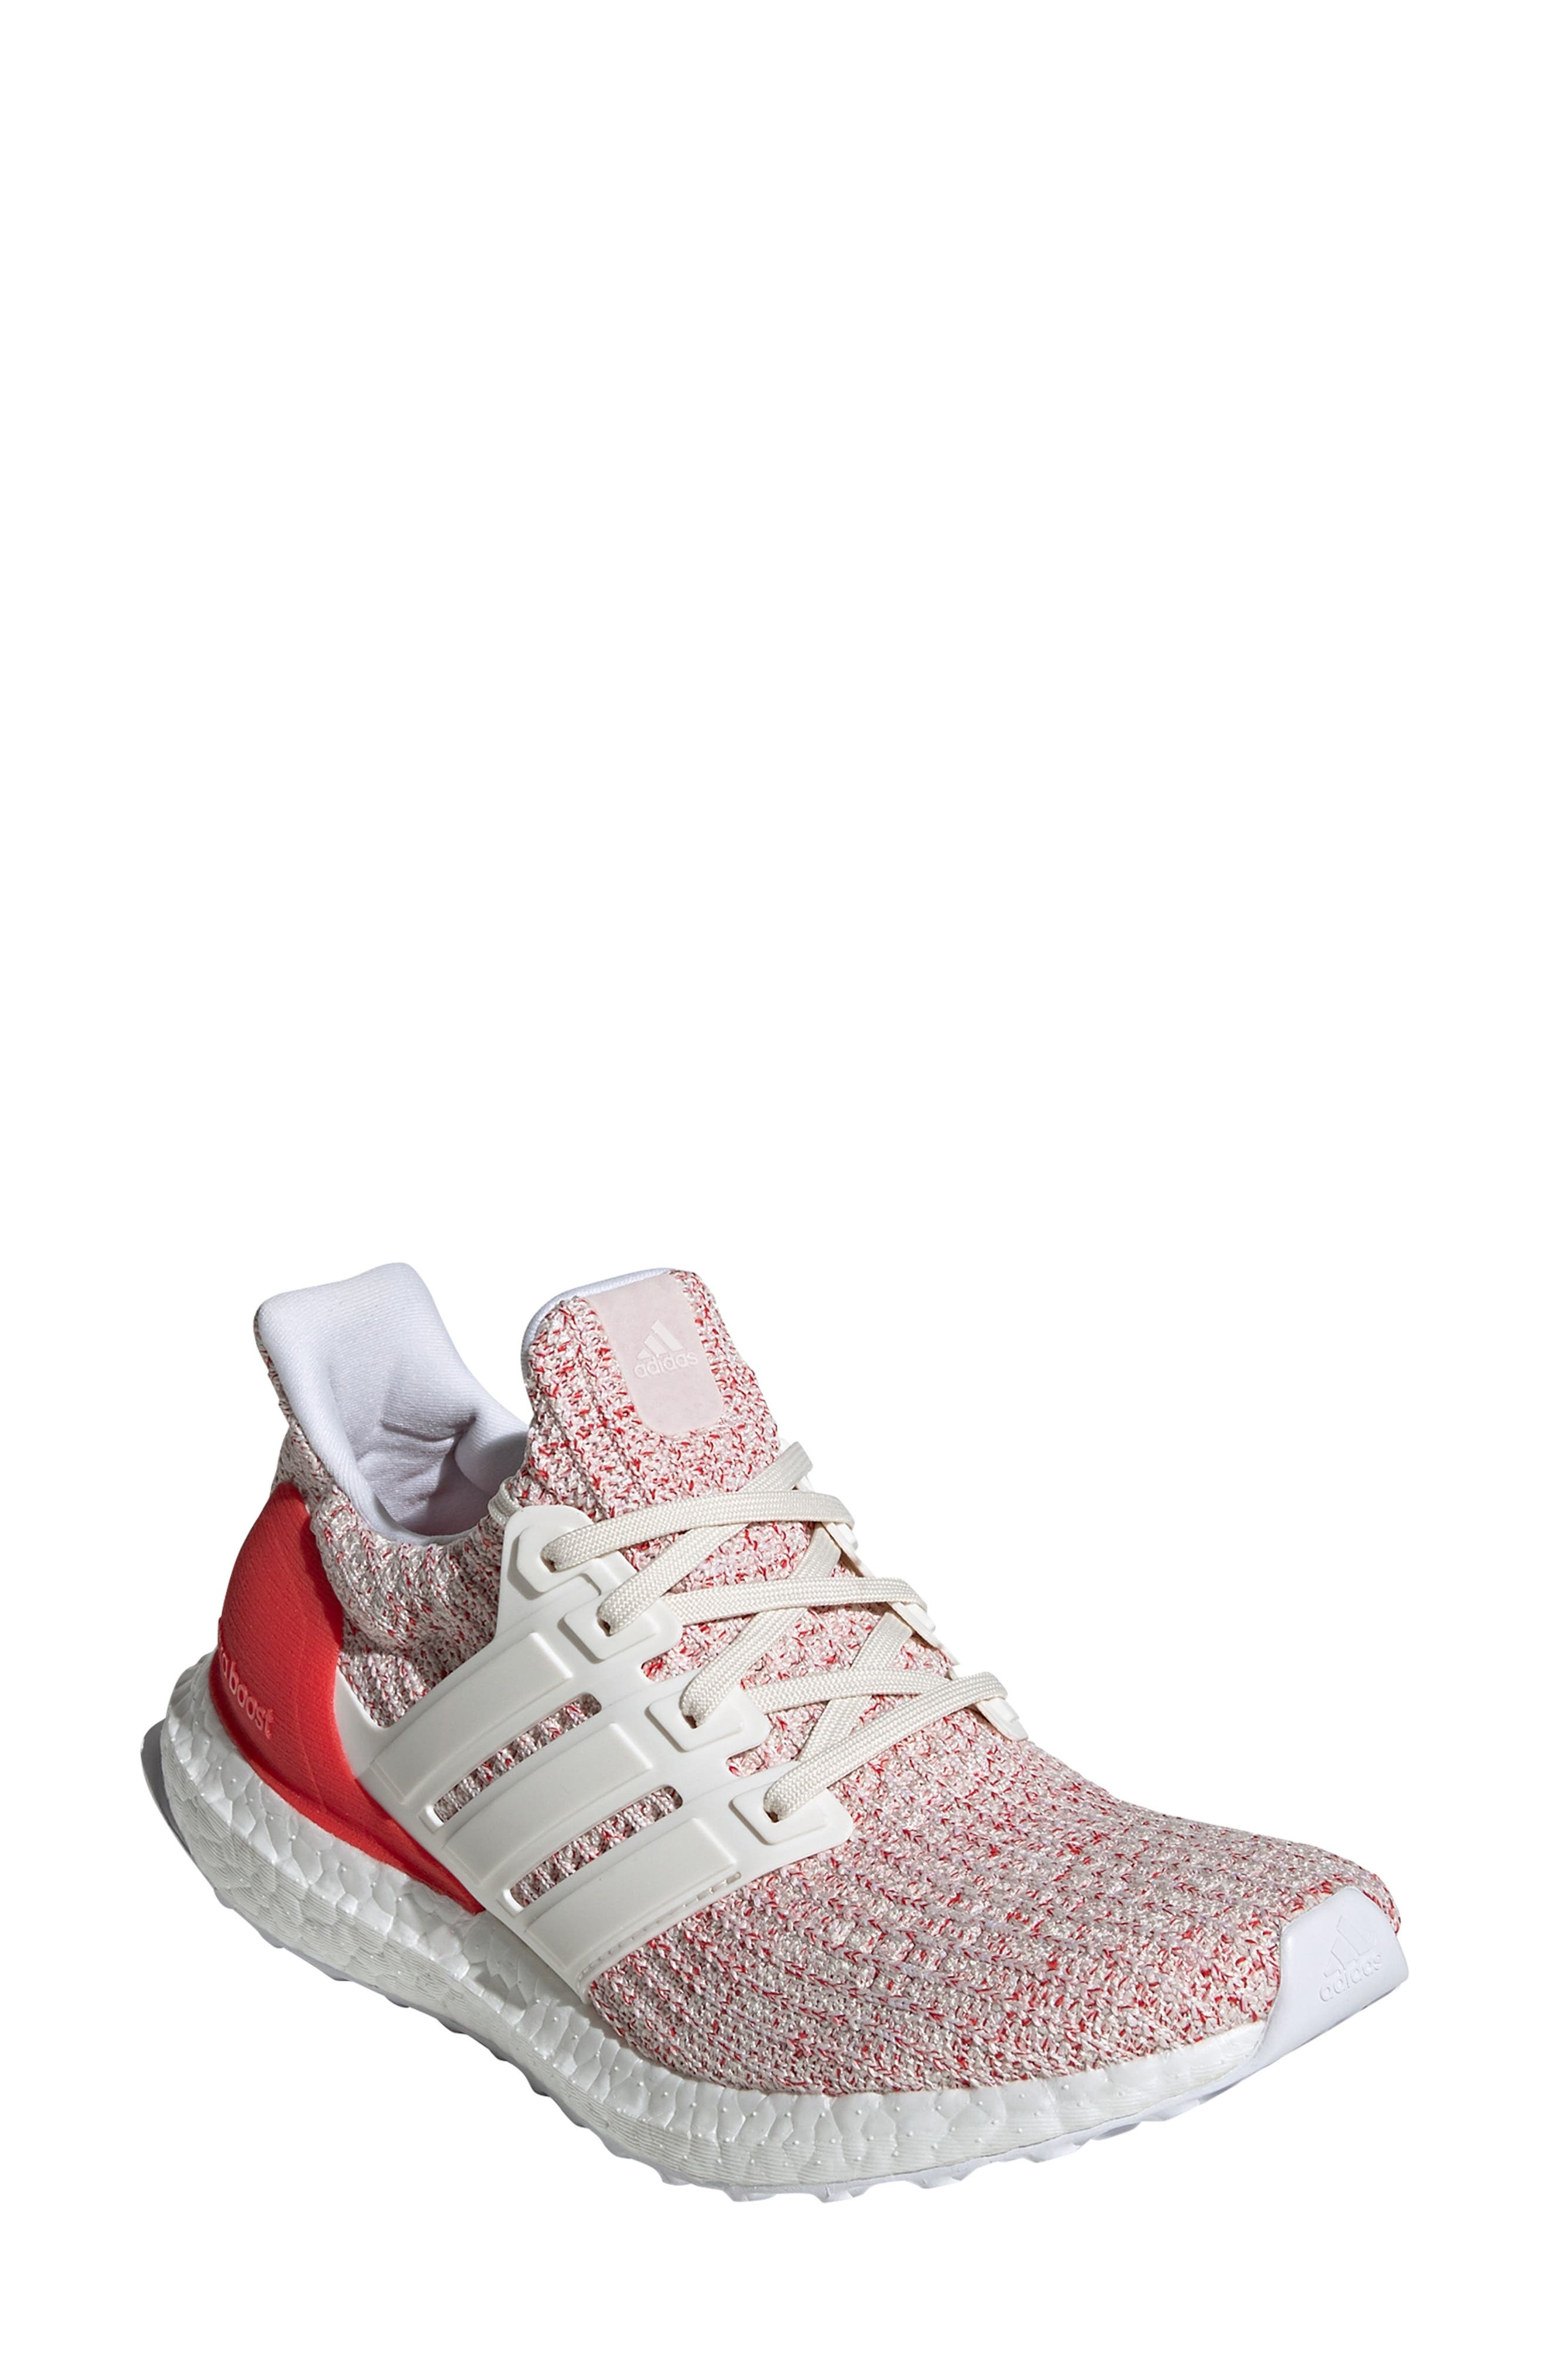 9f3accd9118f Women s Orange Sneakers   Running Shoes